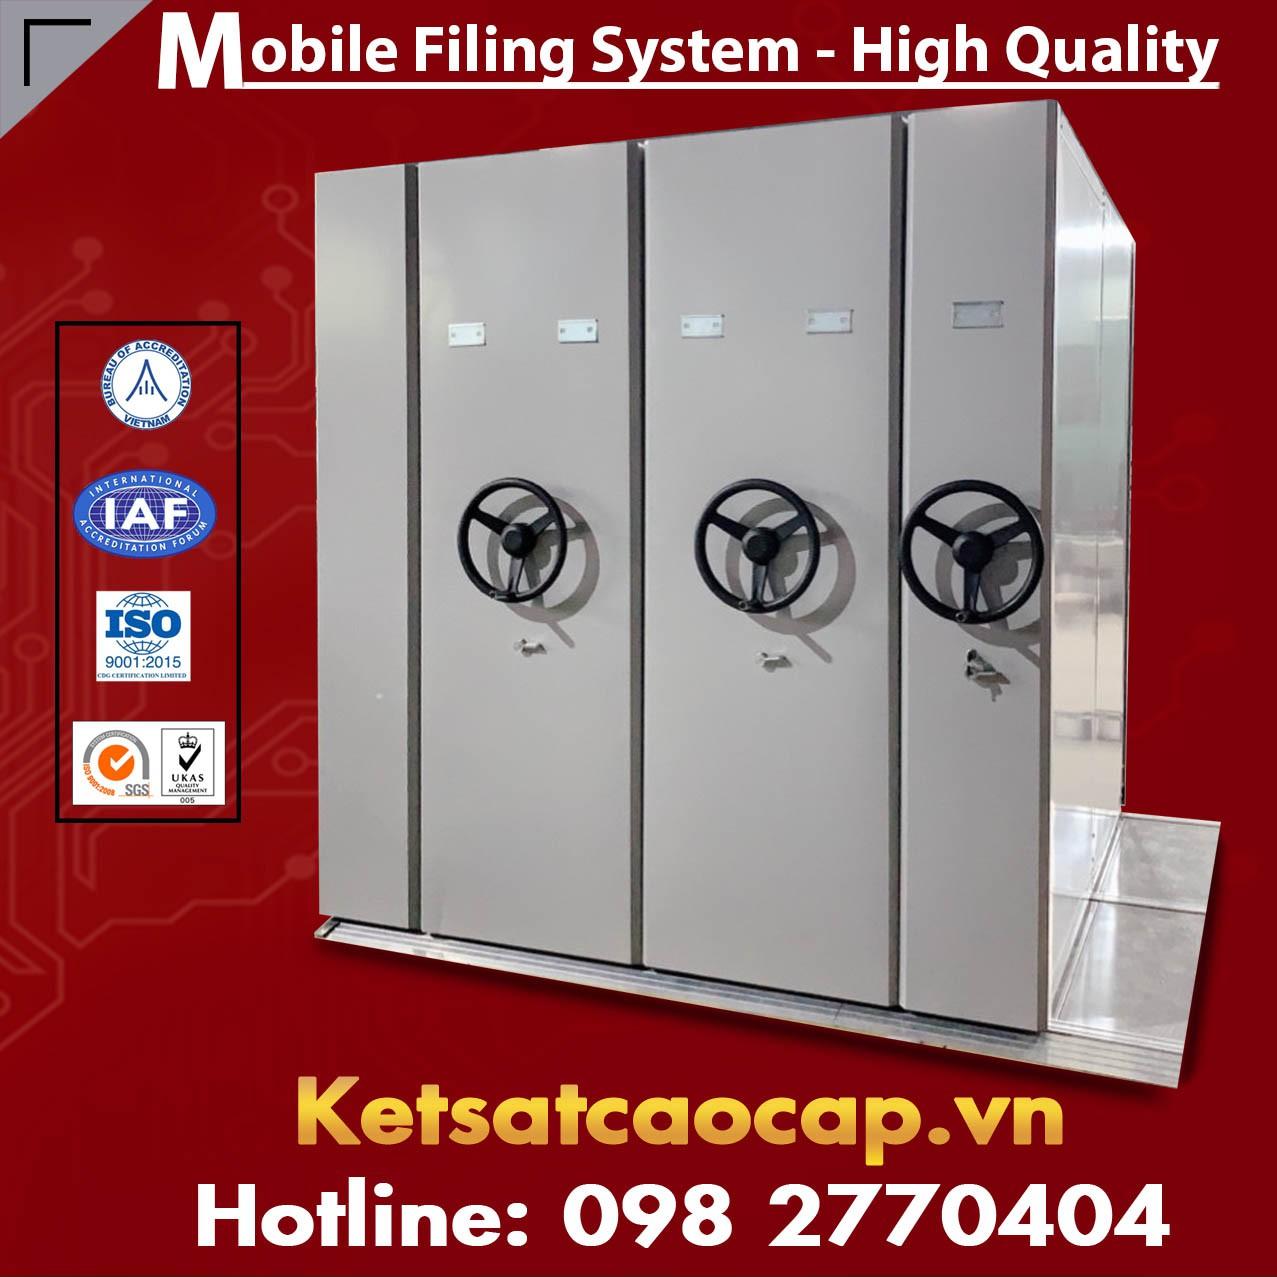 Mobile Filing System